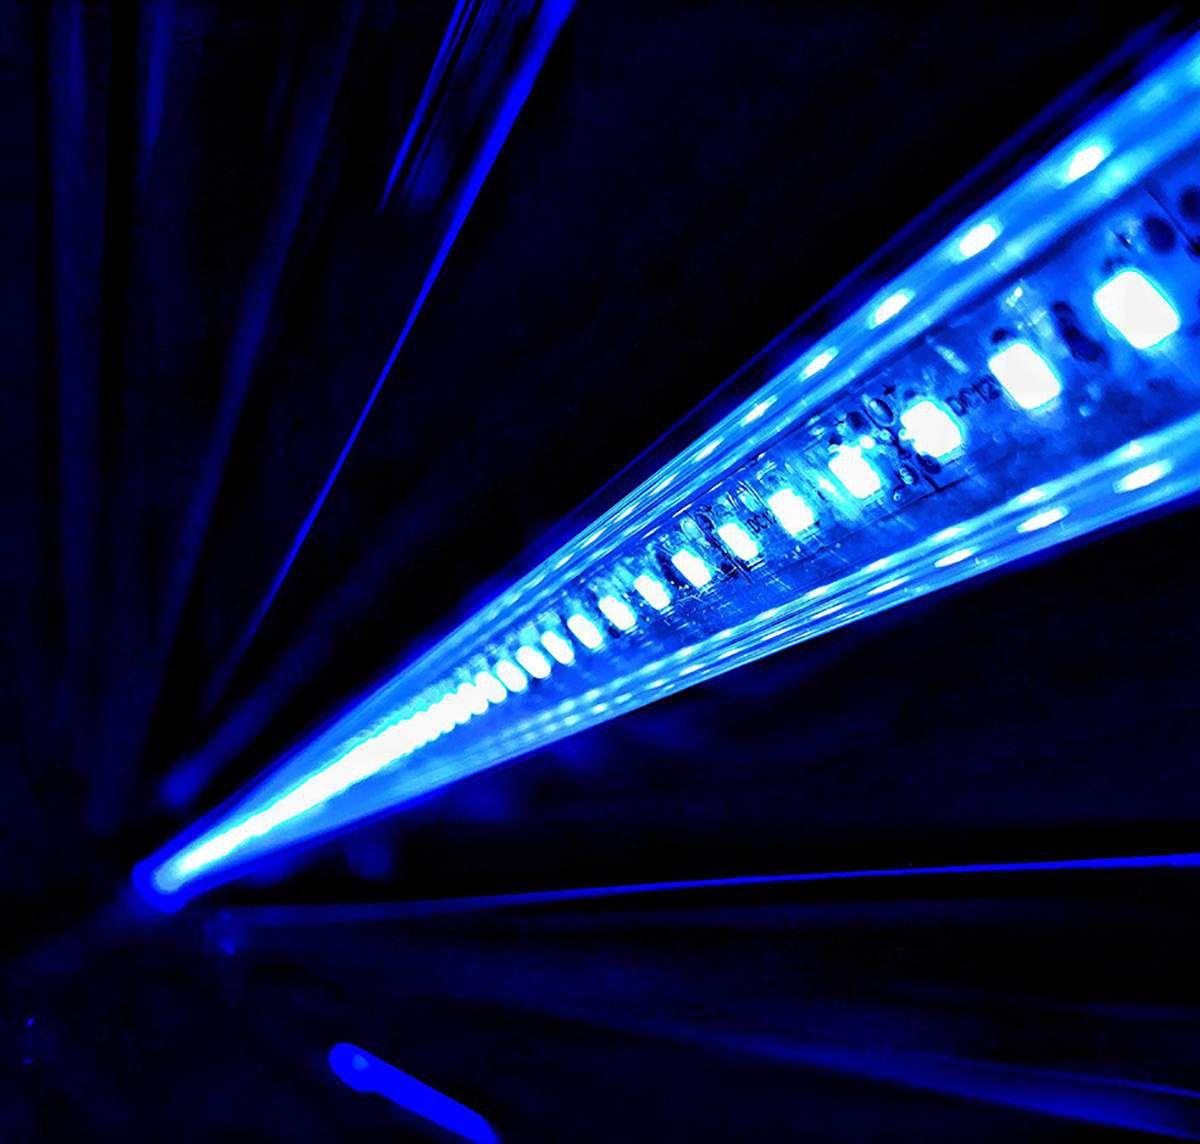 Luminária Althea Pacific Sun Híbrida T5 6x54W+2x LED 46x120cm